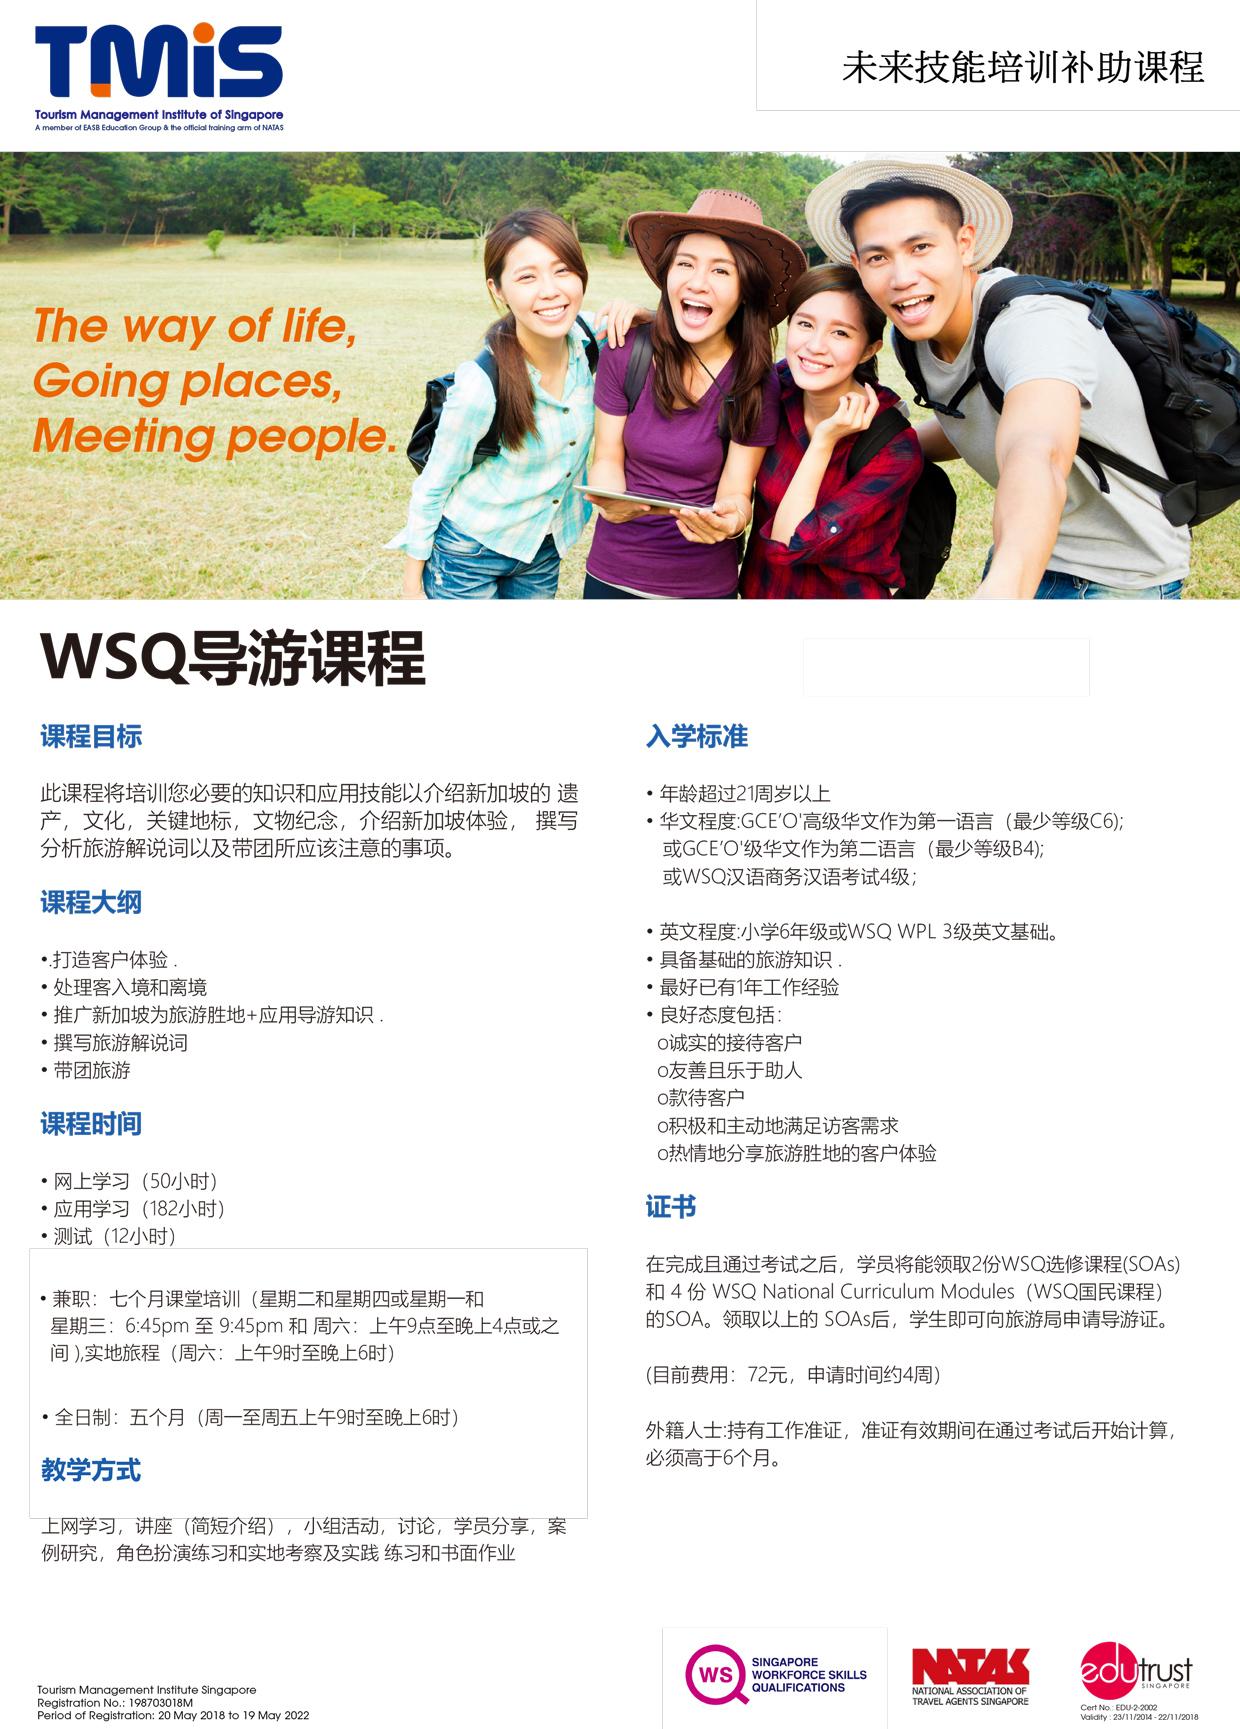 WSQ Tourist Guide Programme I